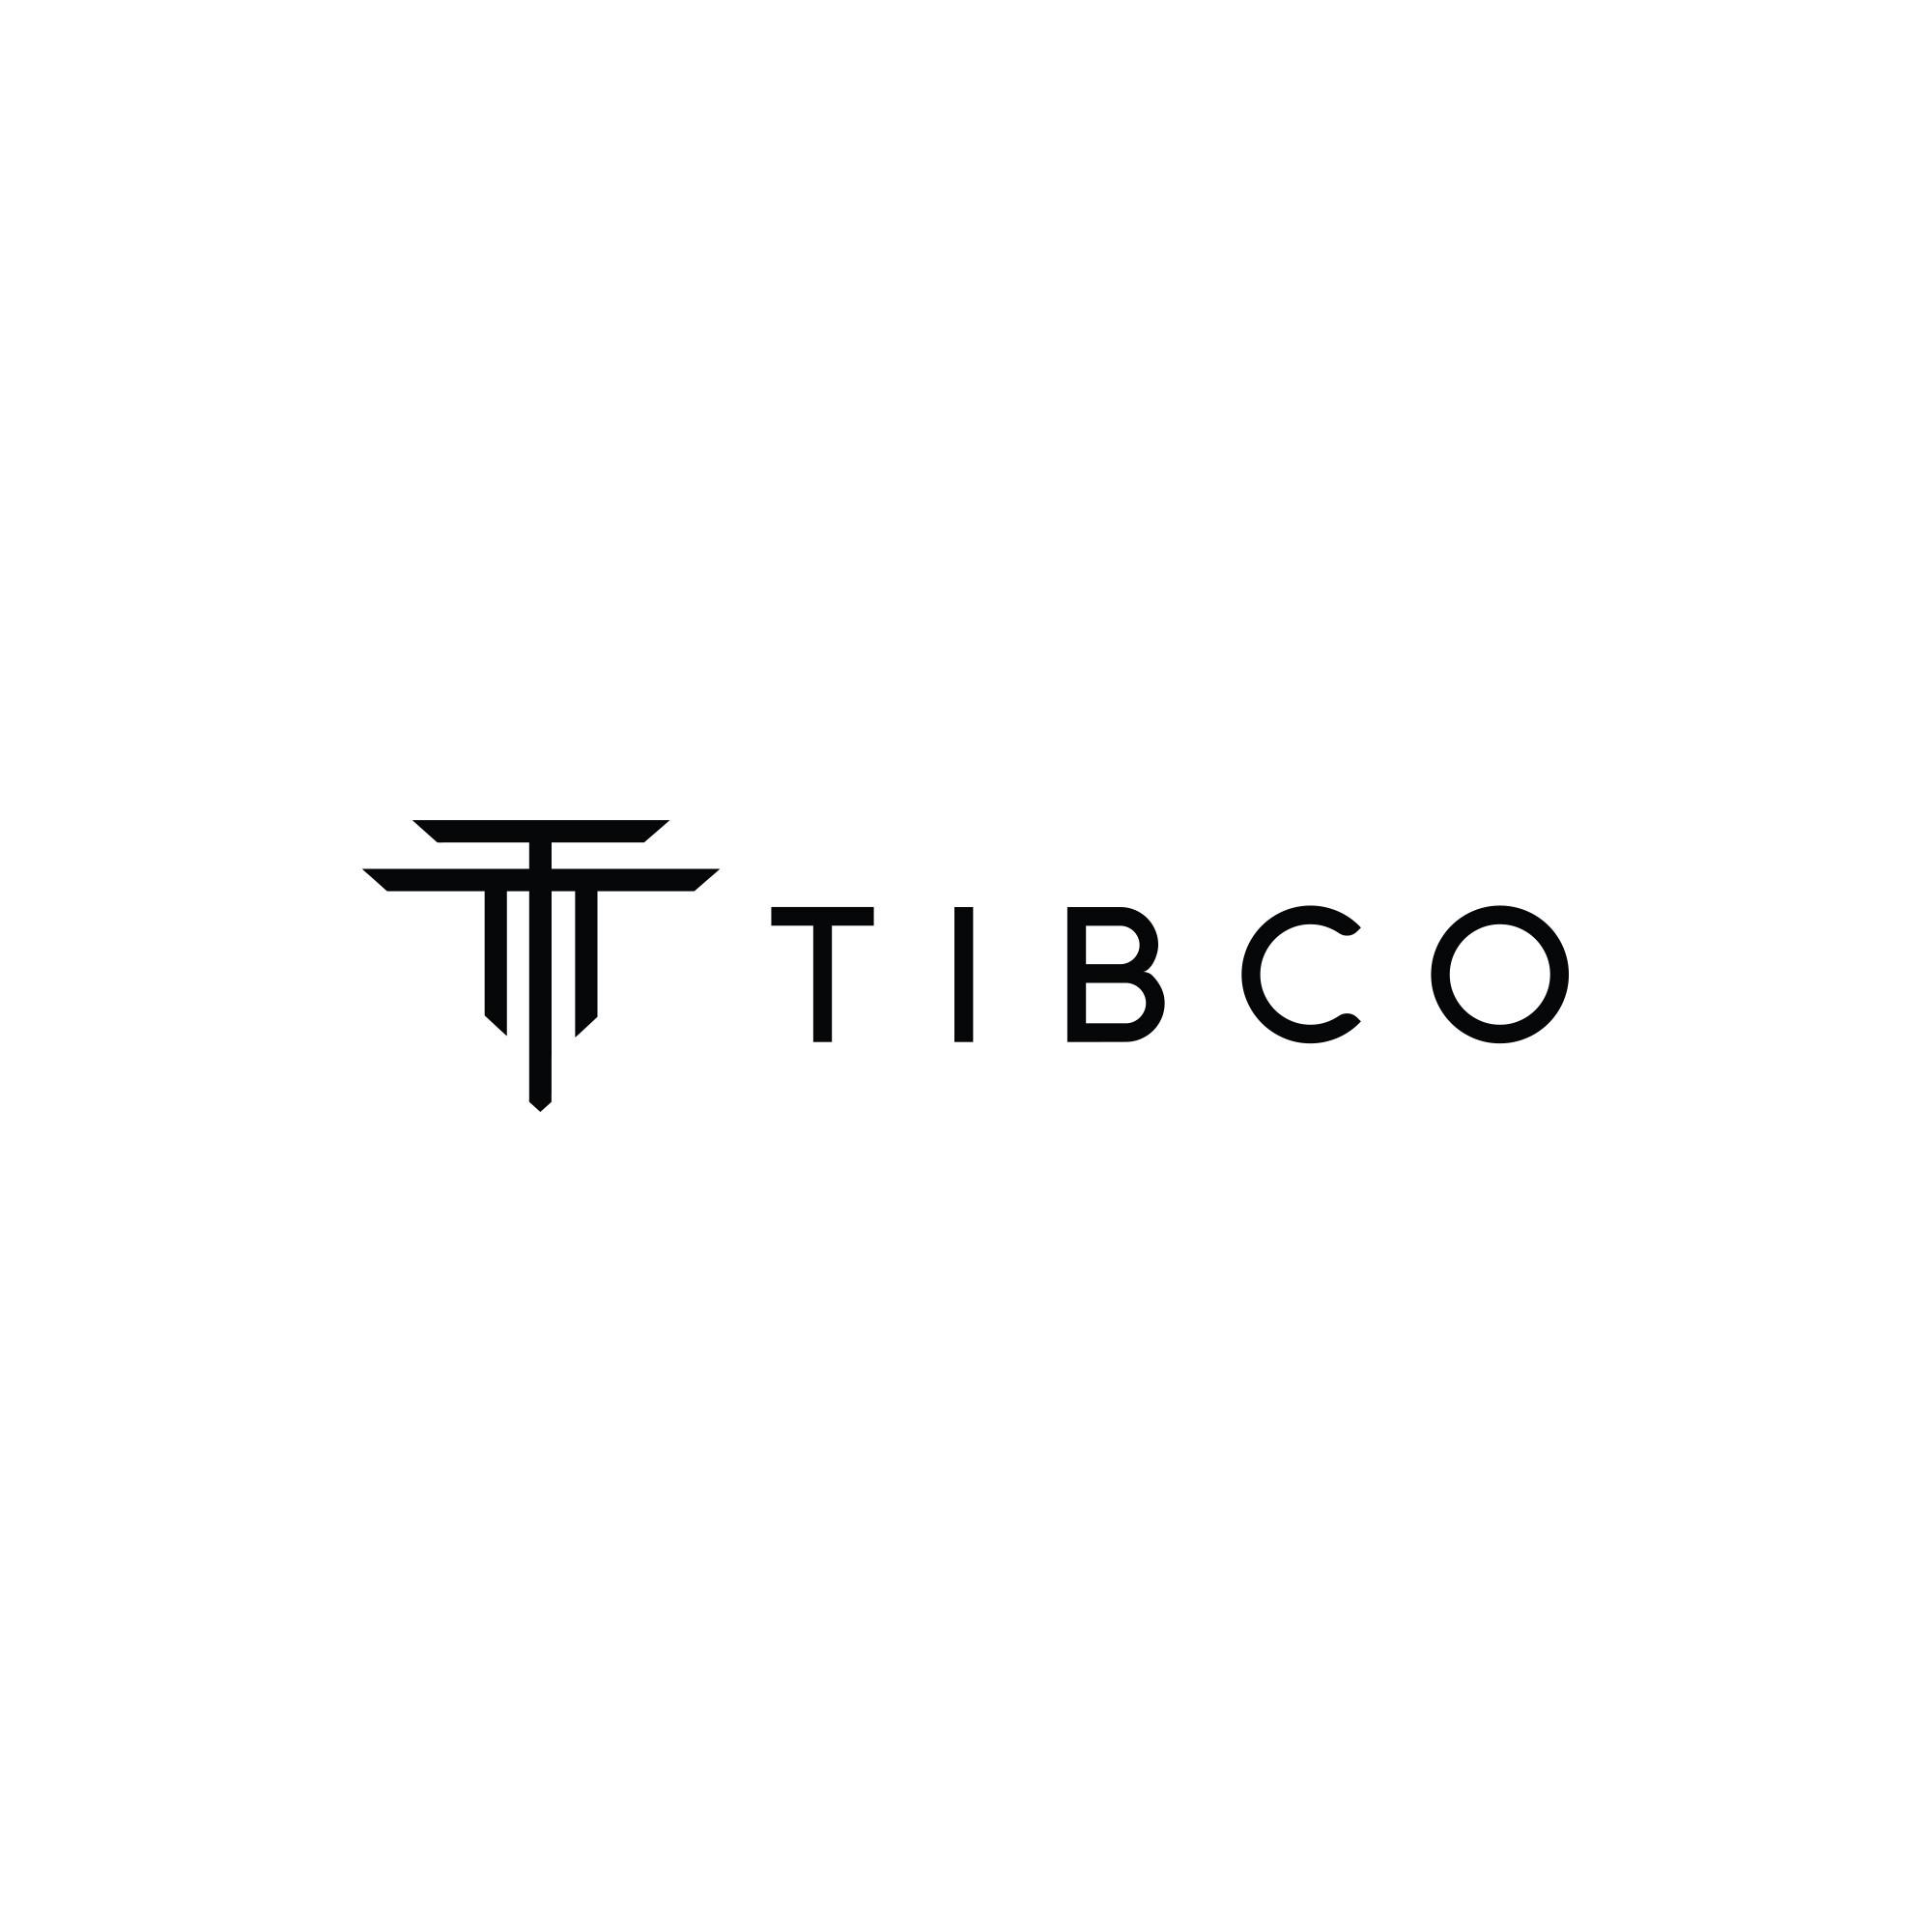 Help Tibco, the concrete company, find its logo!